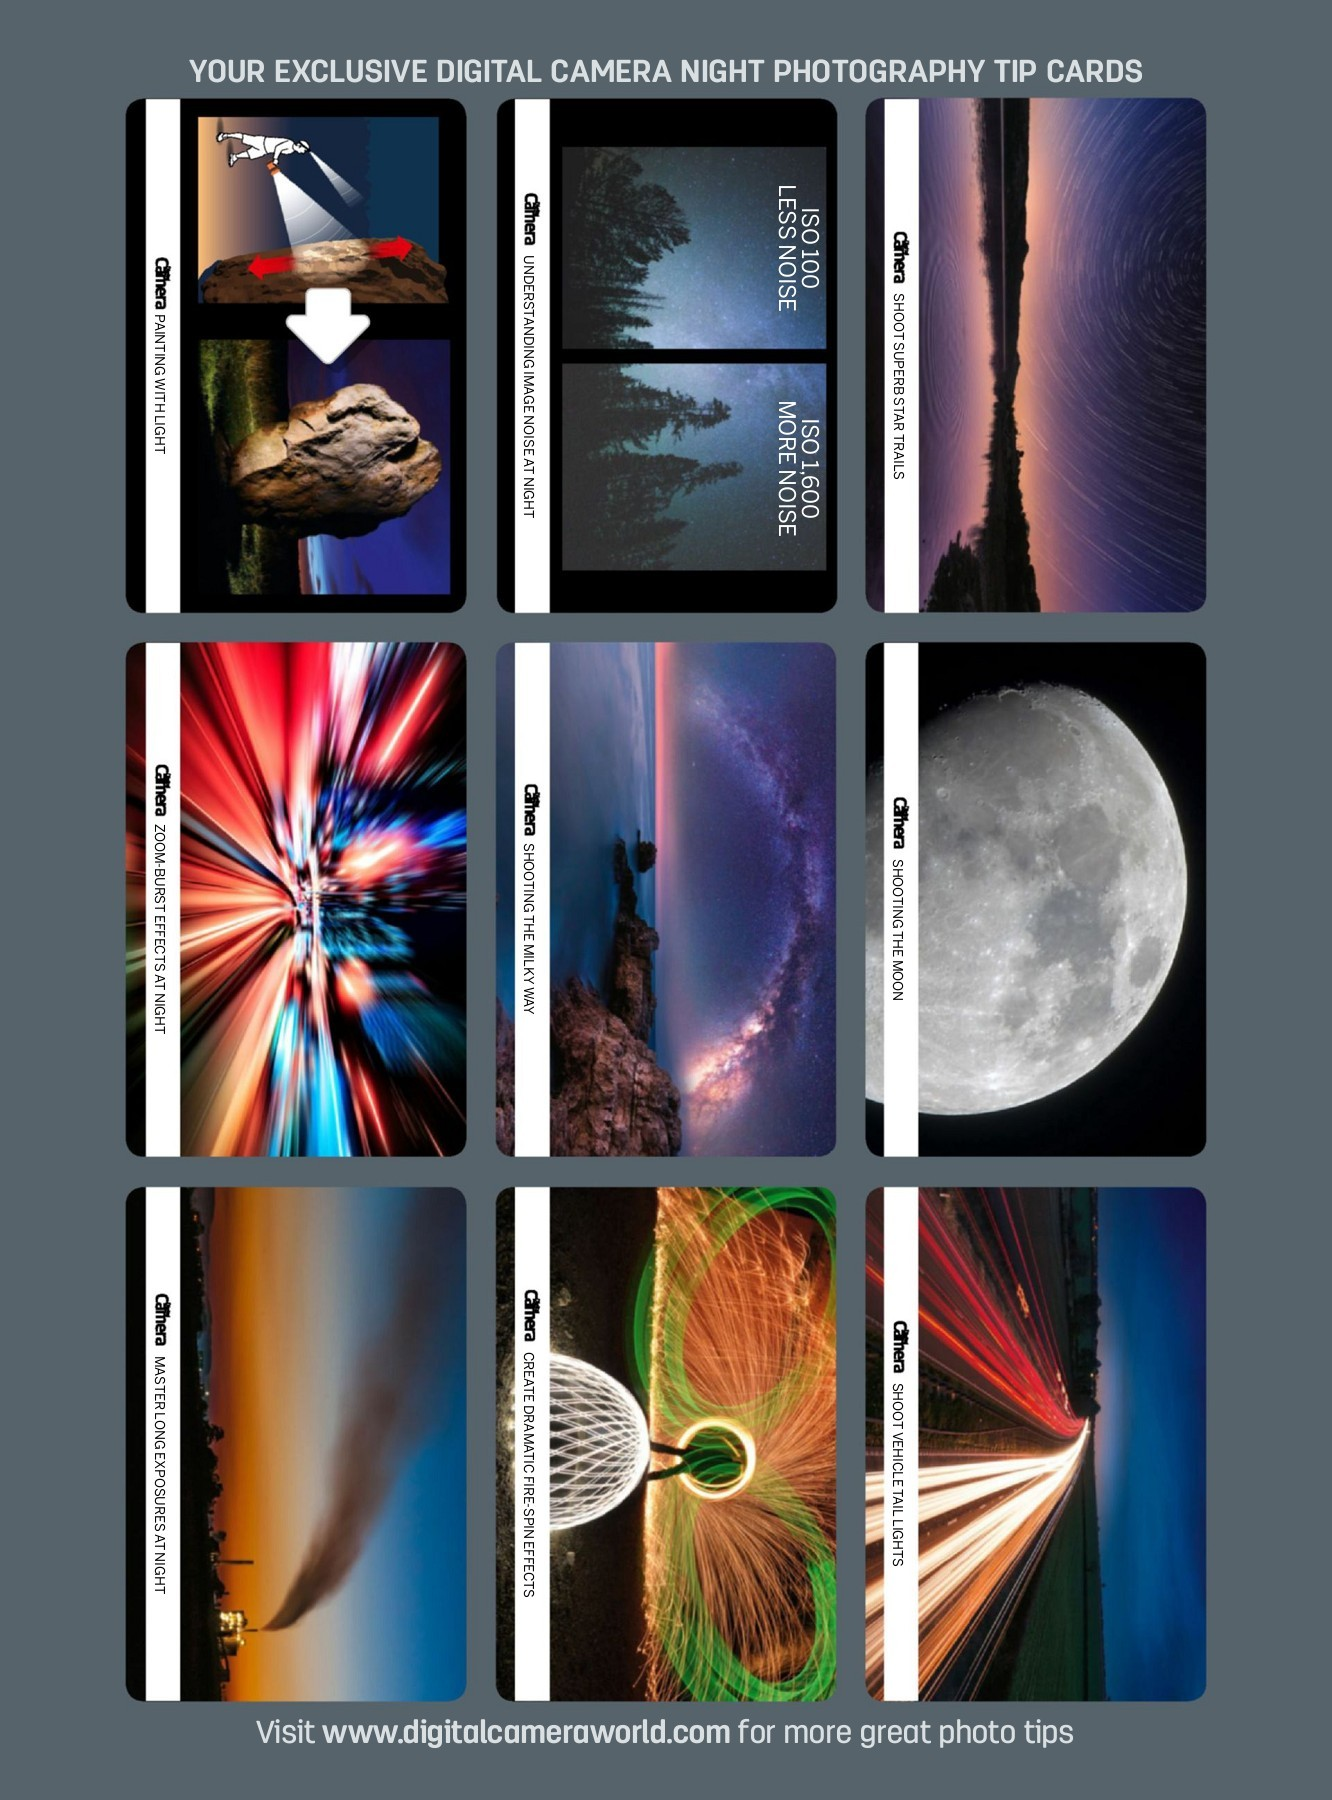 KODAK The Art of Digital Photography Mood Ambience /& Dramatic Effects